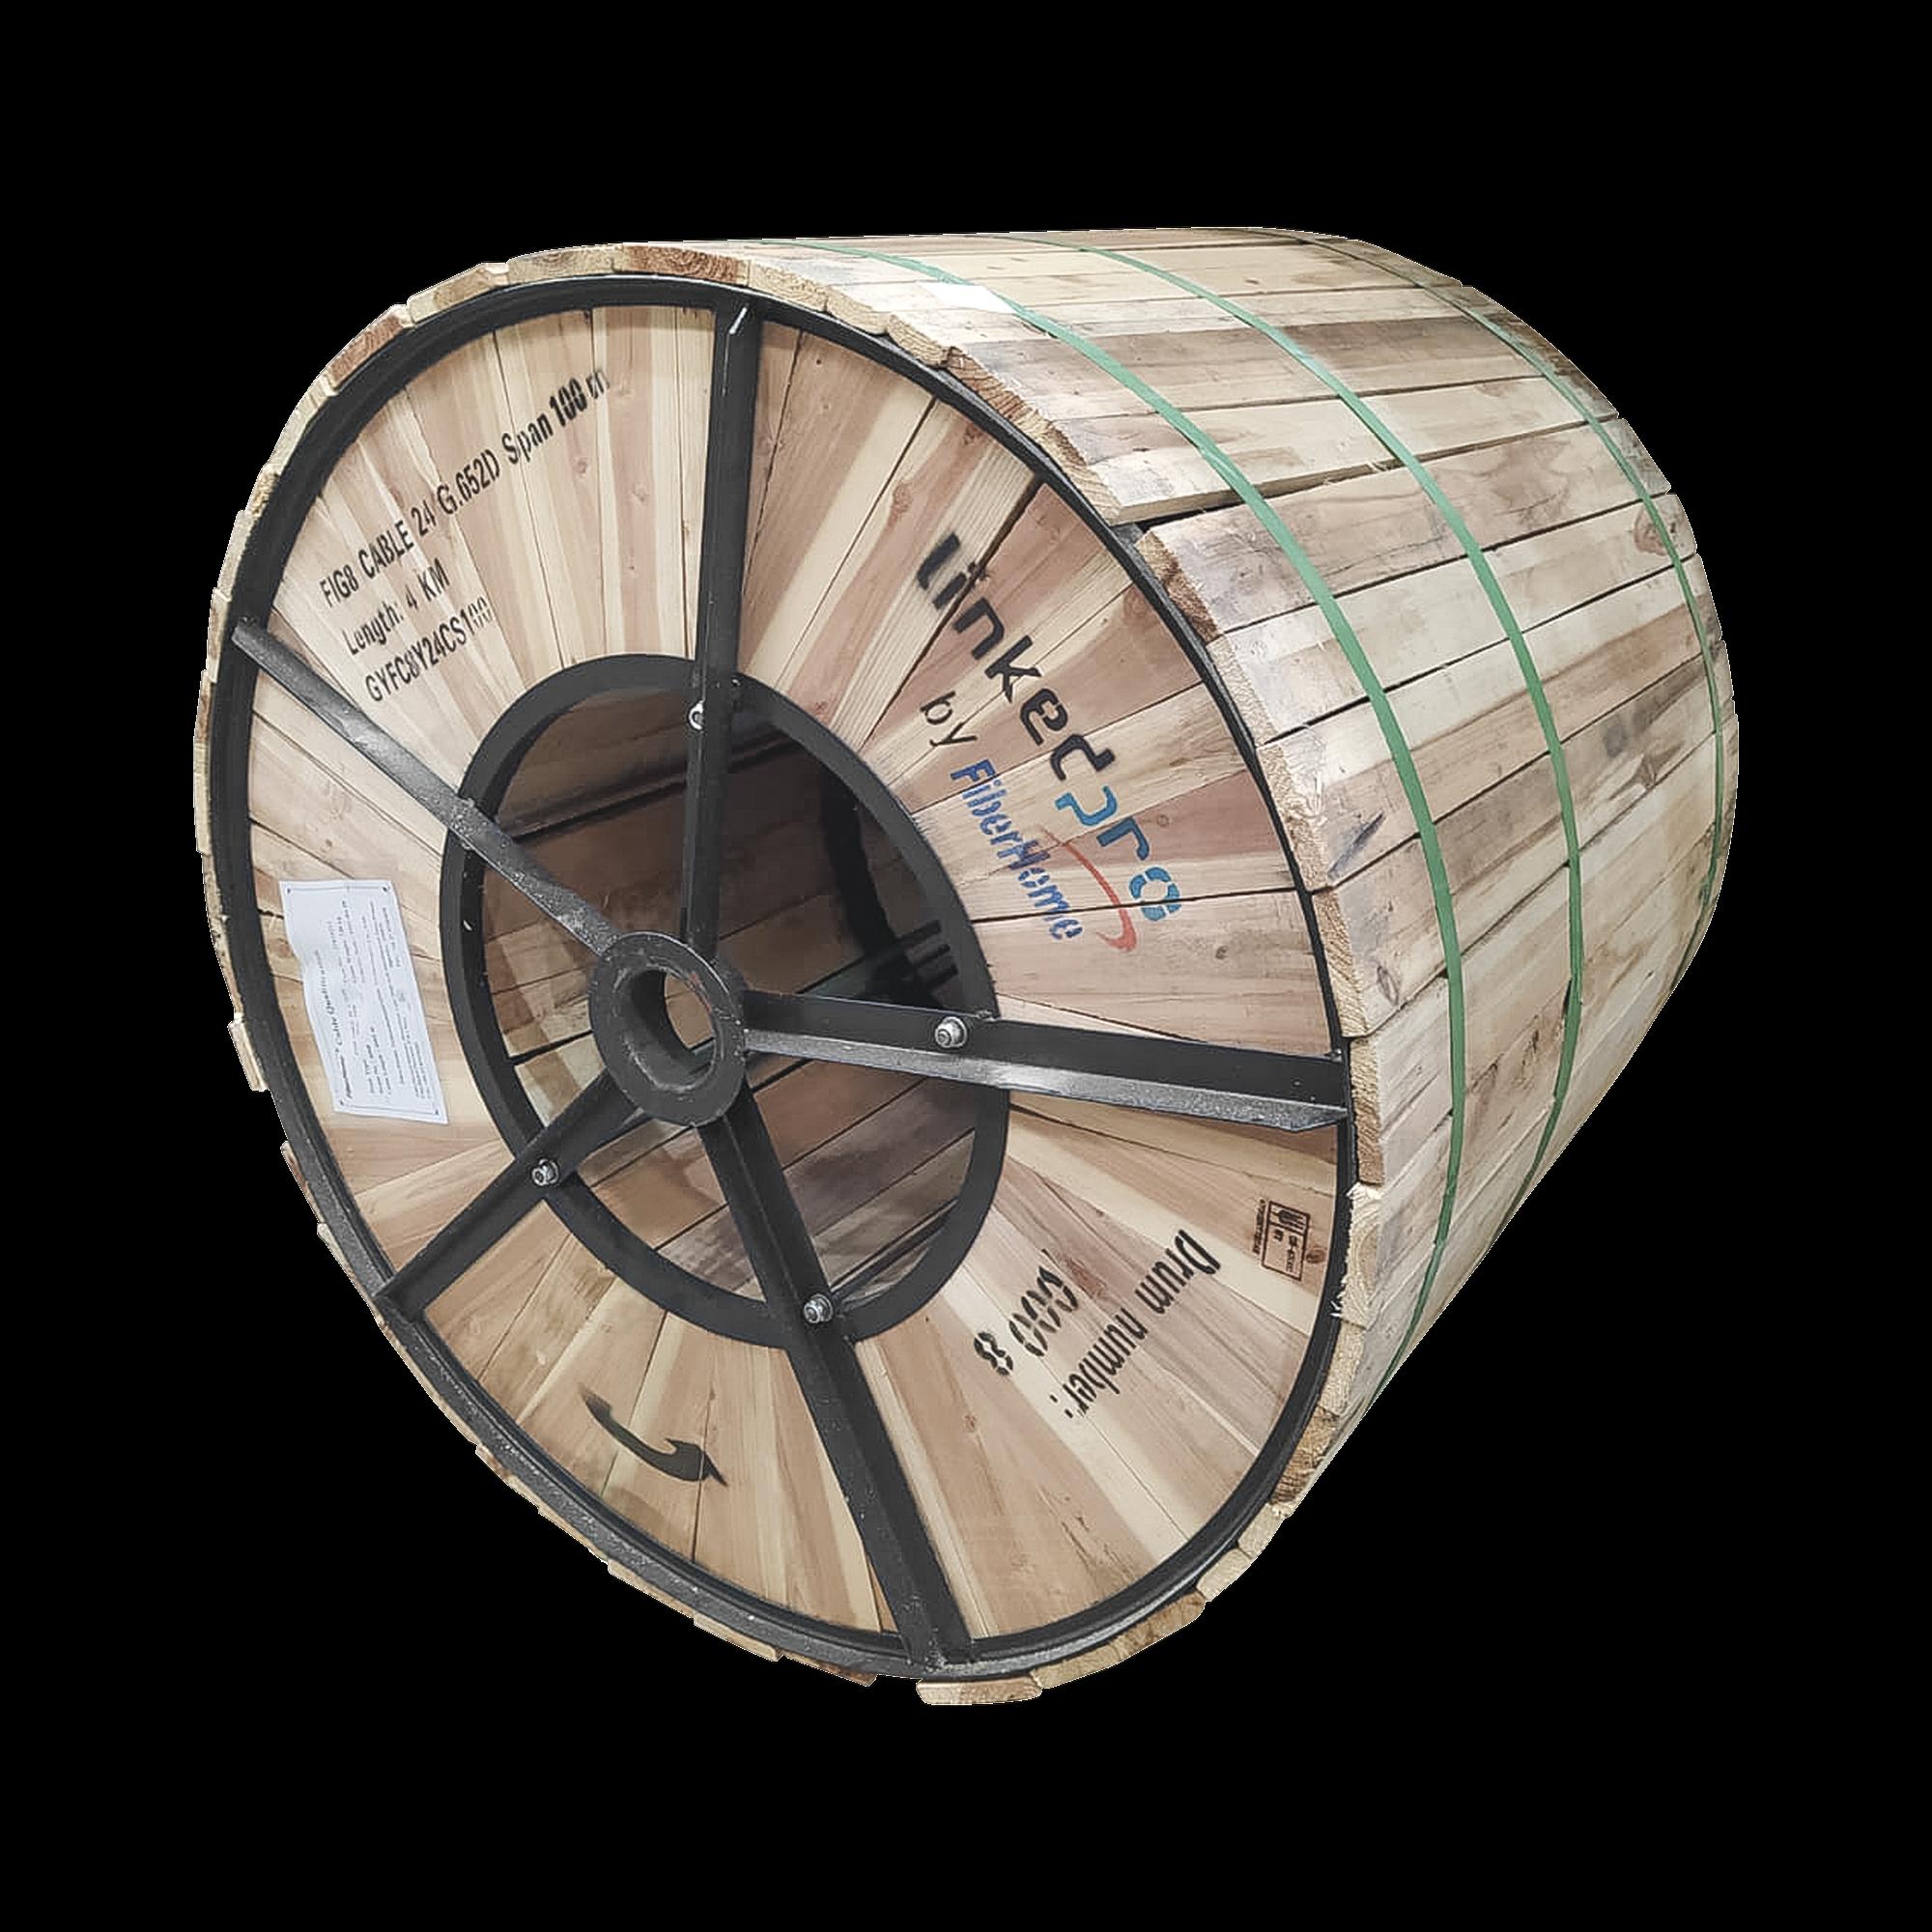 Carrete de 4 km de Fibra óptica Aérea Figura 8 G.652D, Monomodo de 24 Hilos, Exterior, Span 100, Loose Tube